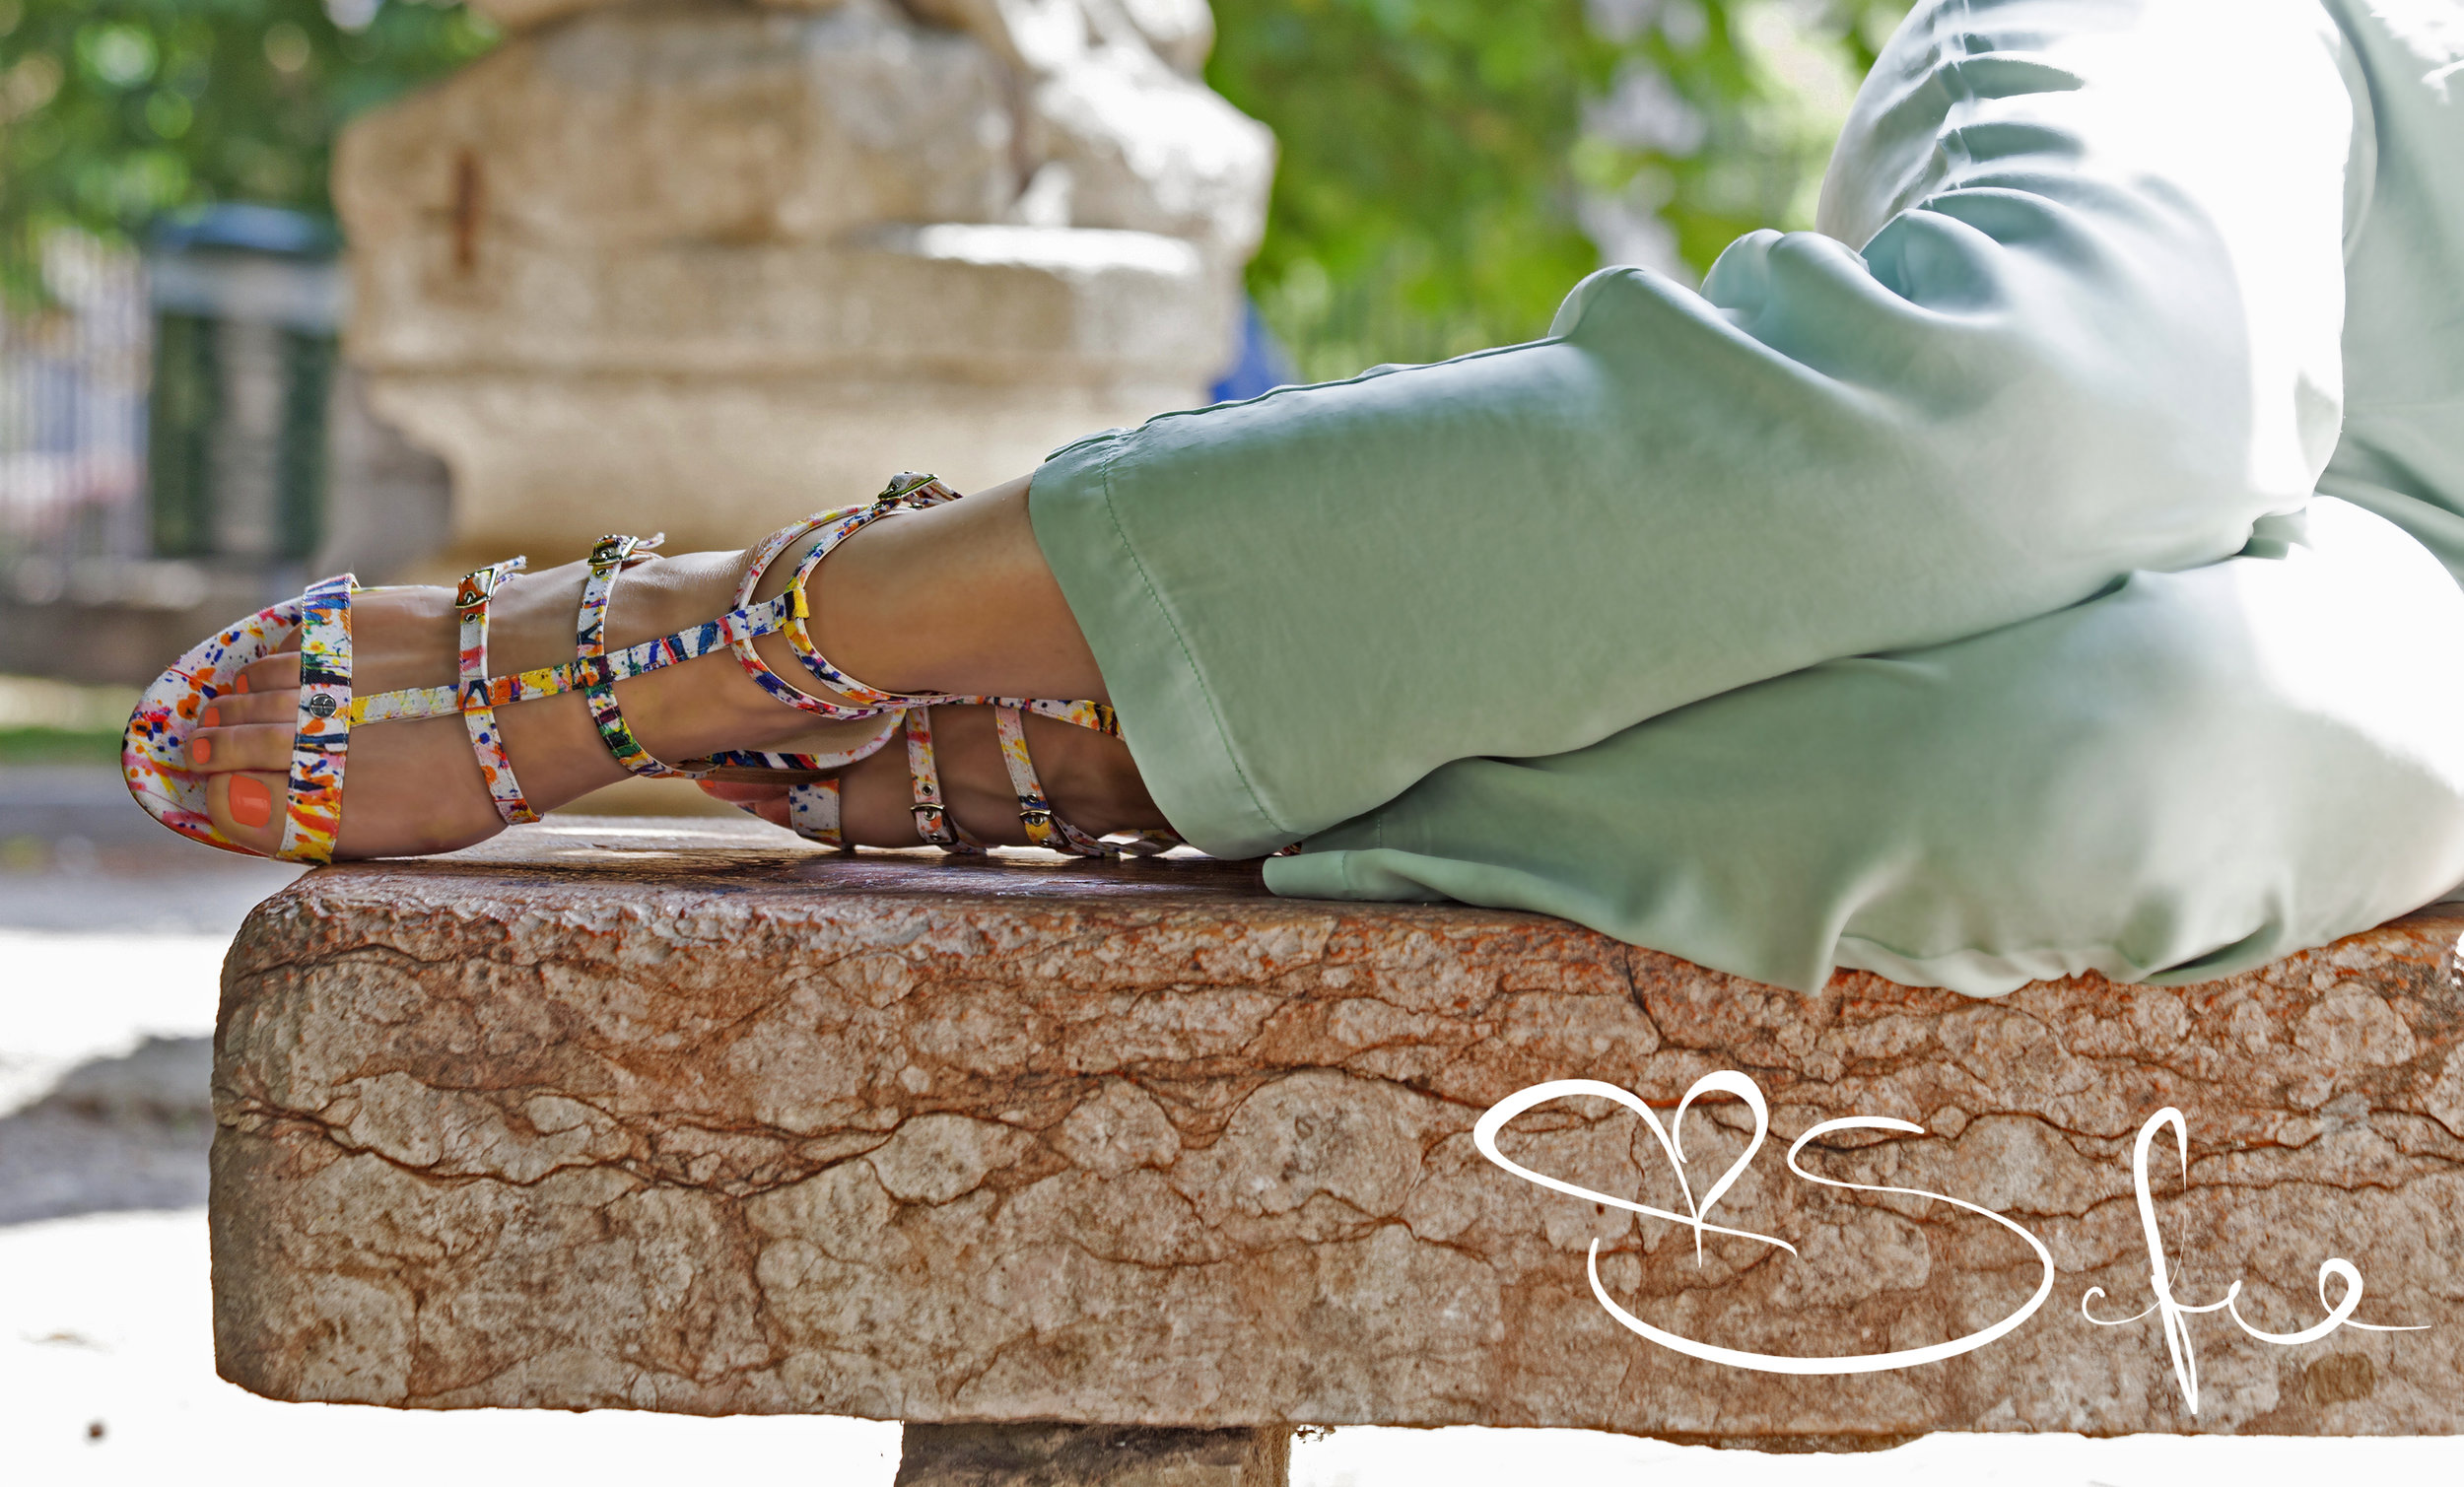 Image: PLAGE Sandal by Love Sofie